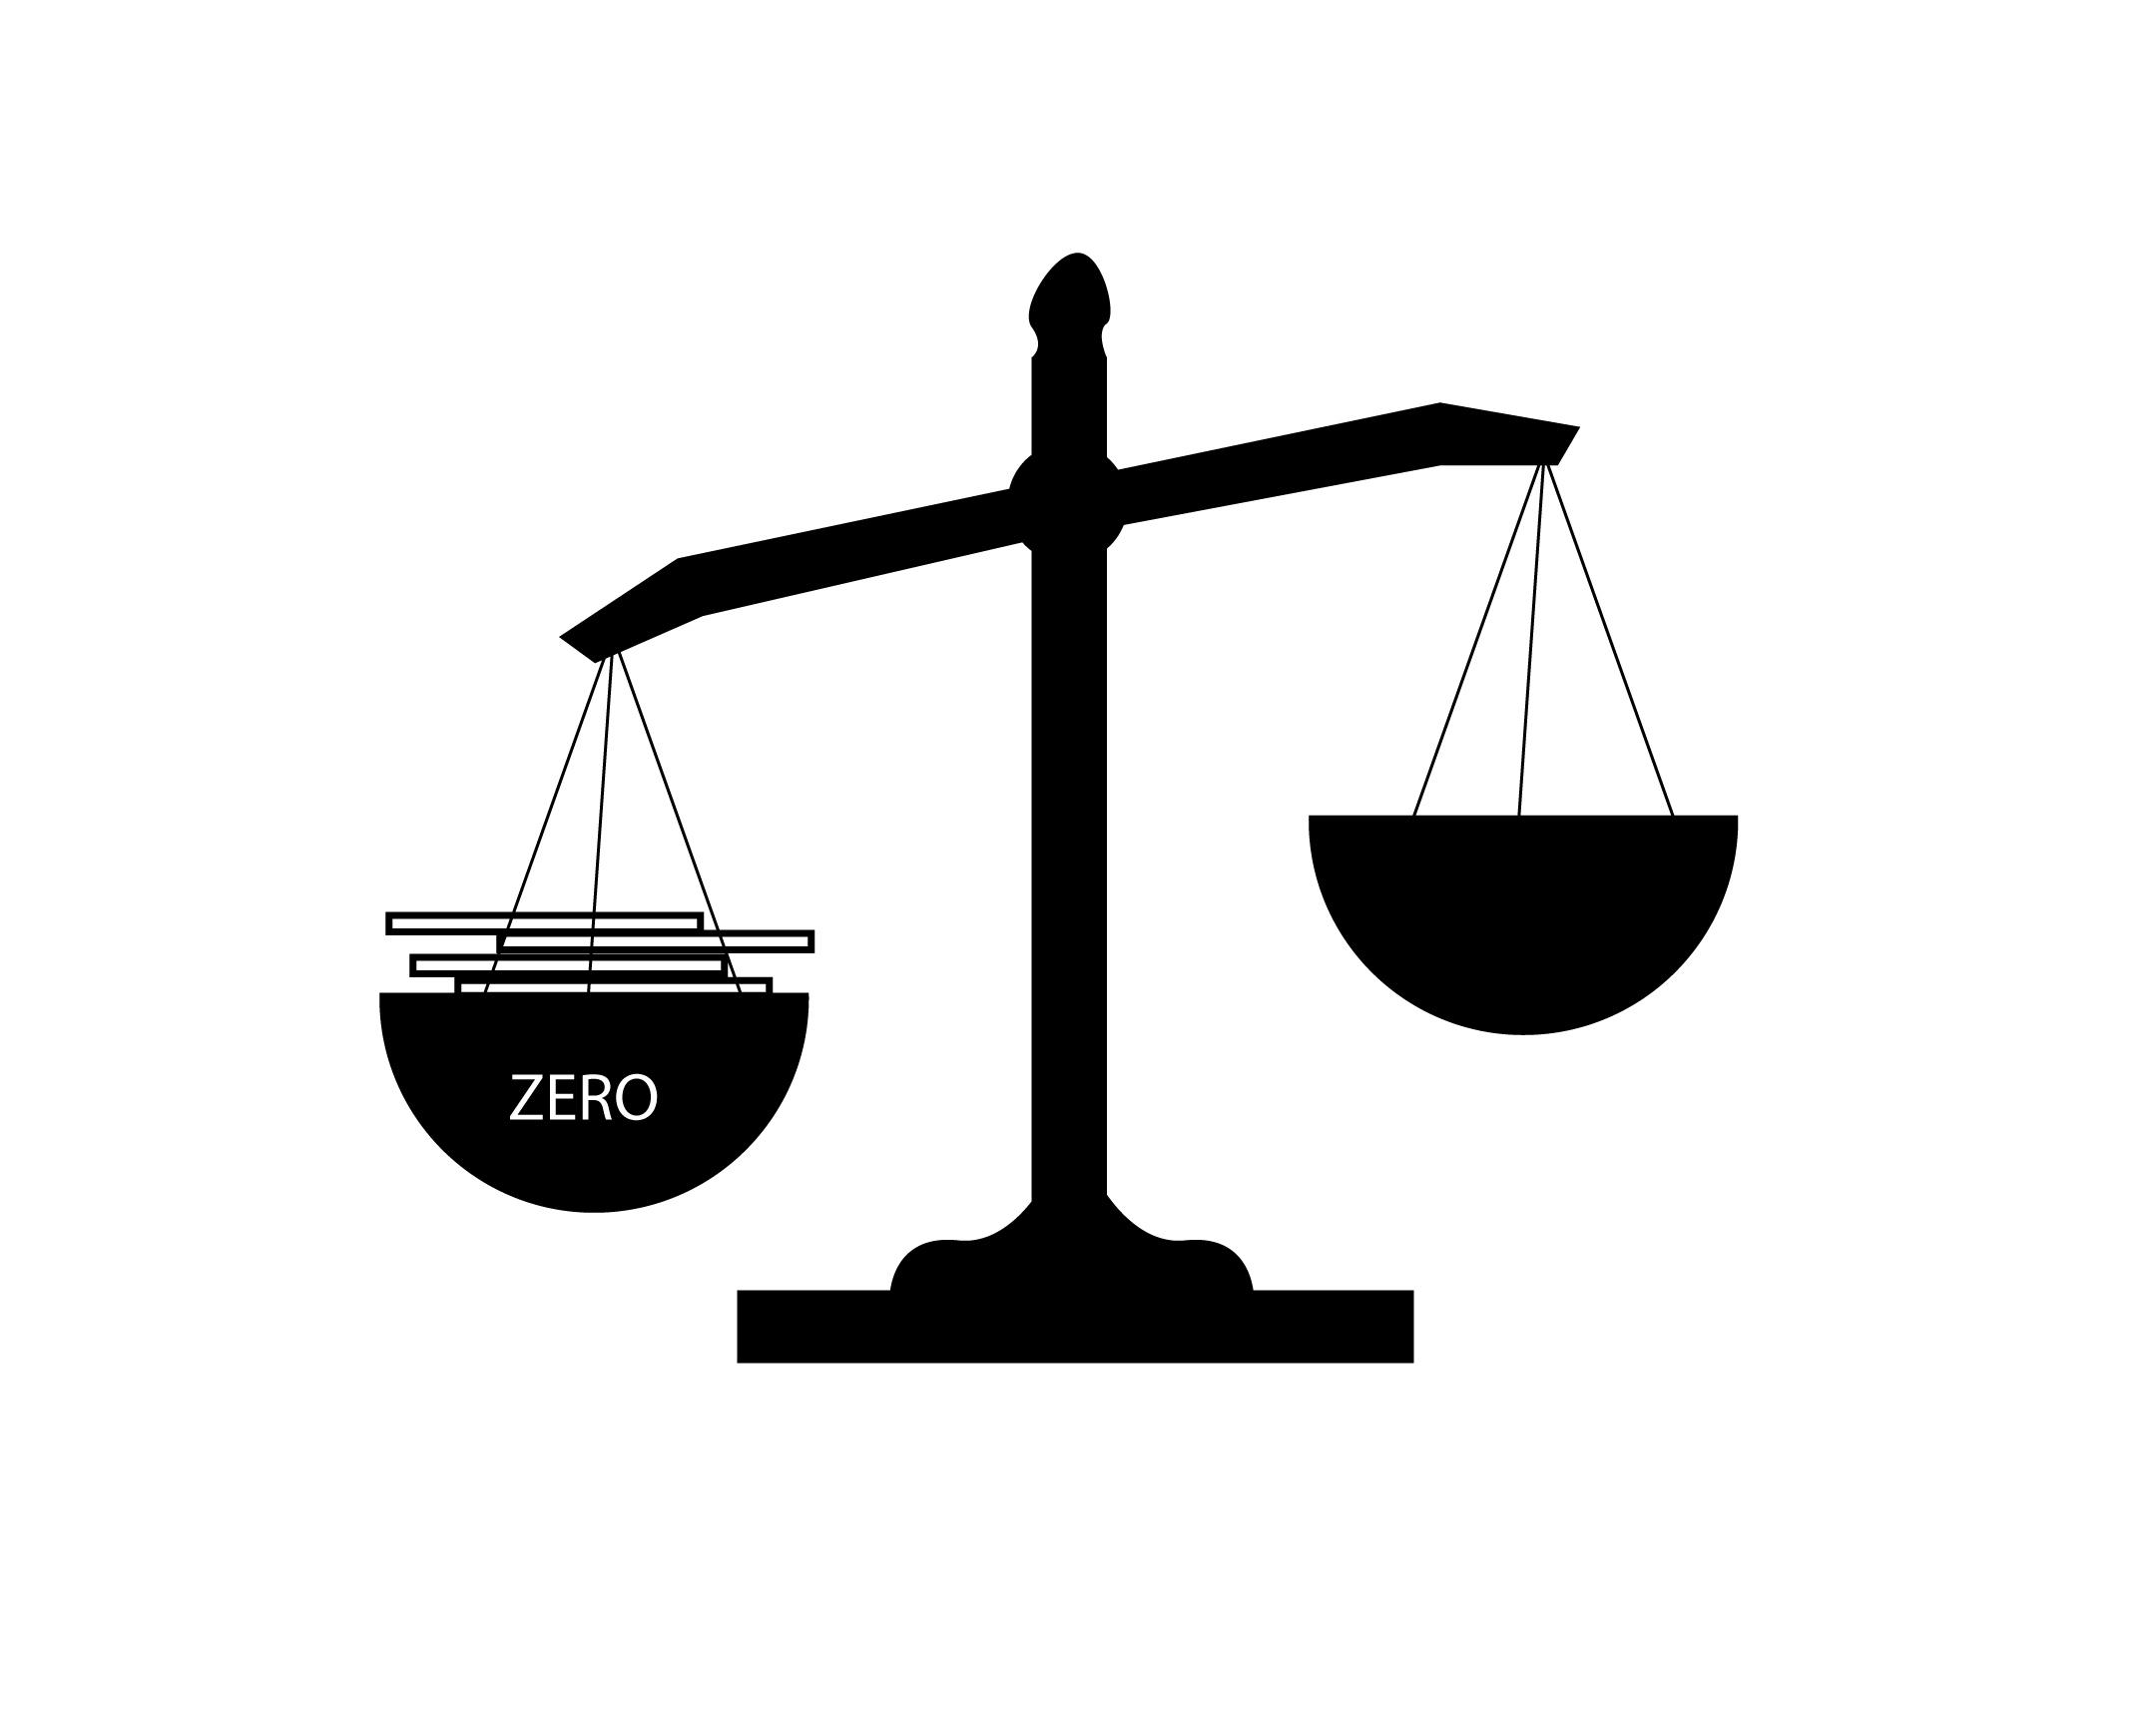 Zero Tolerance Means Zero Adaptability Zero Reporting